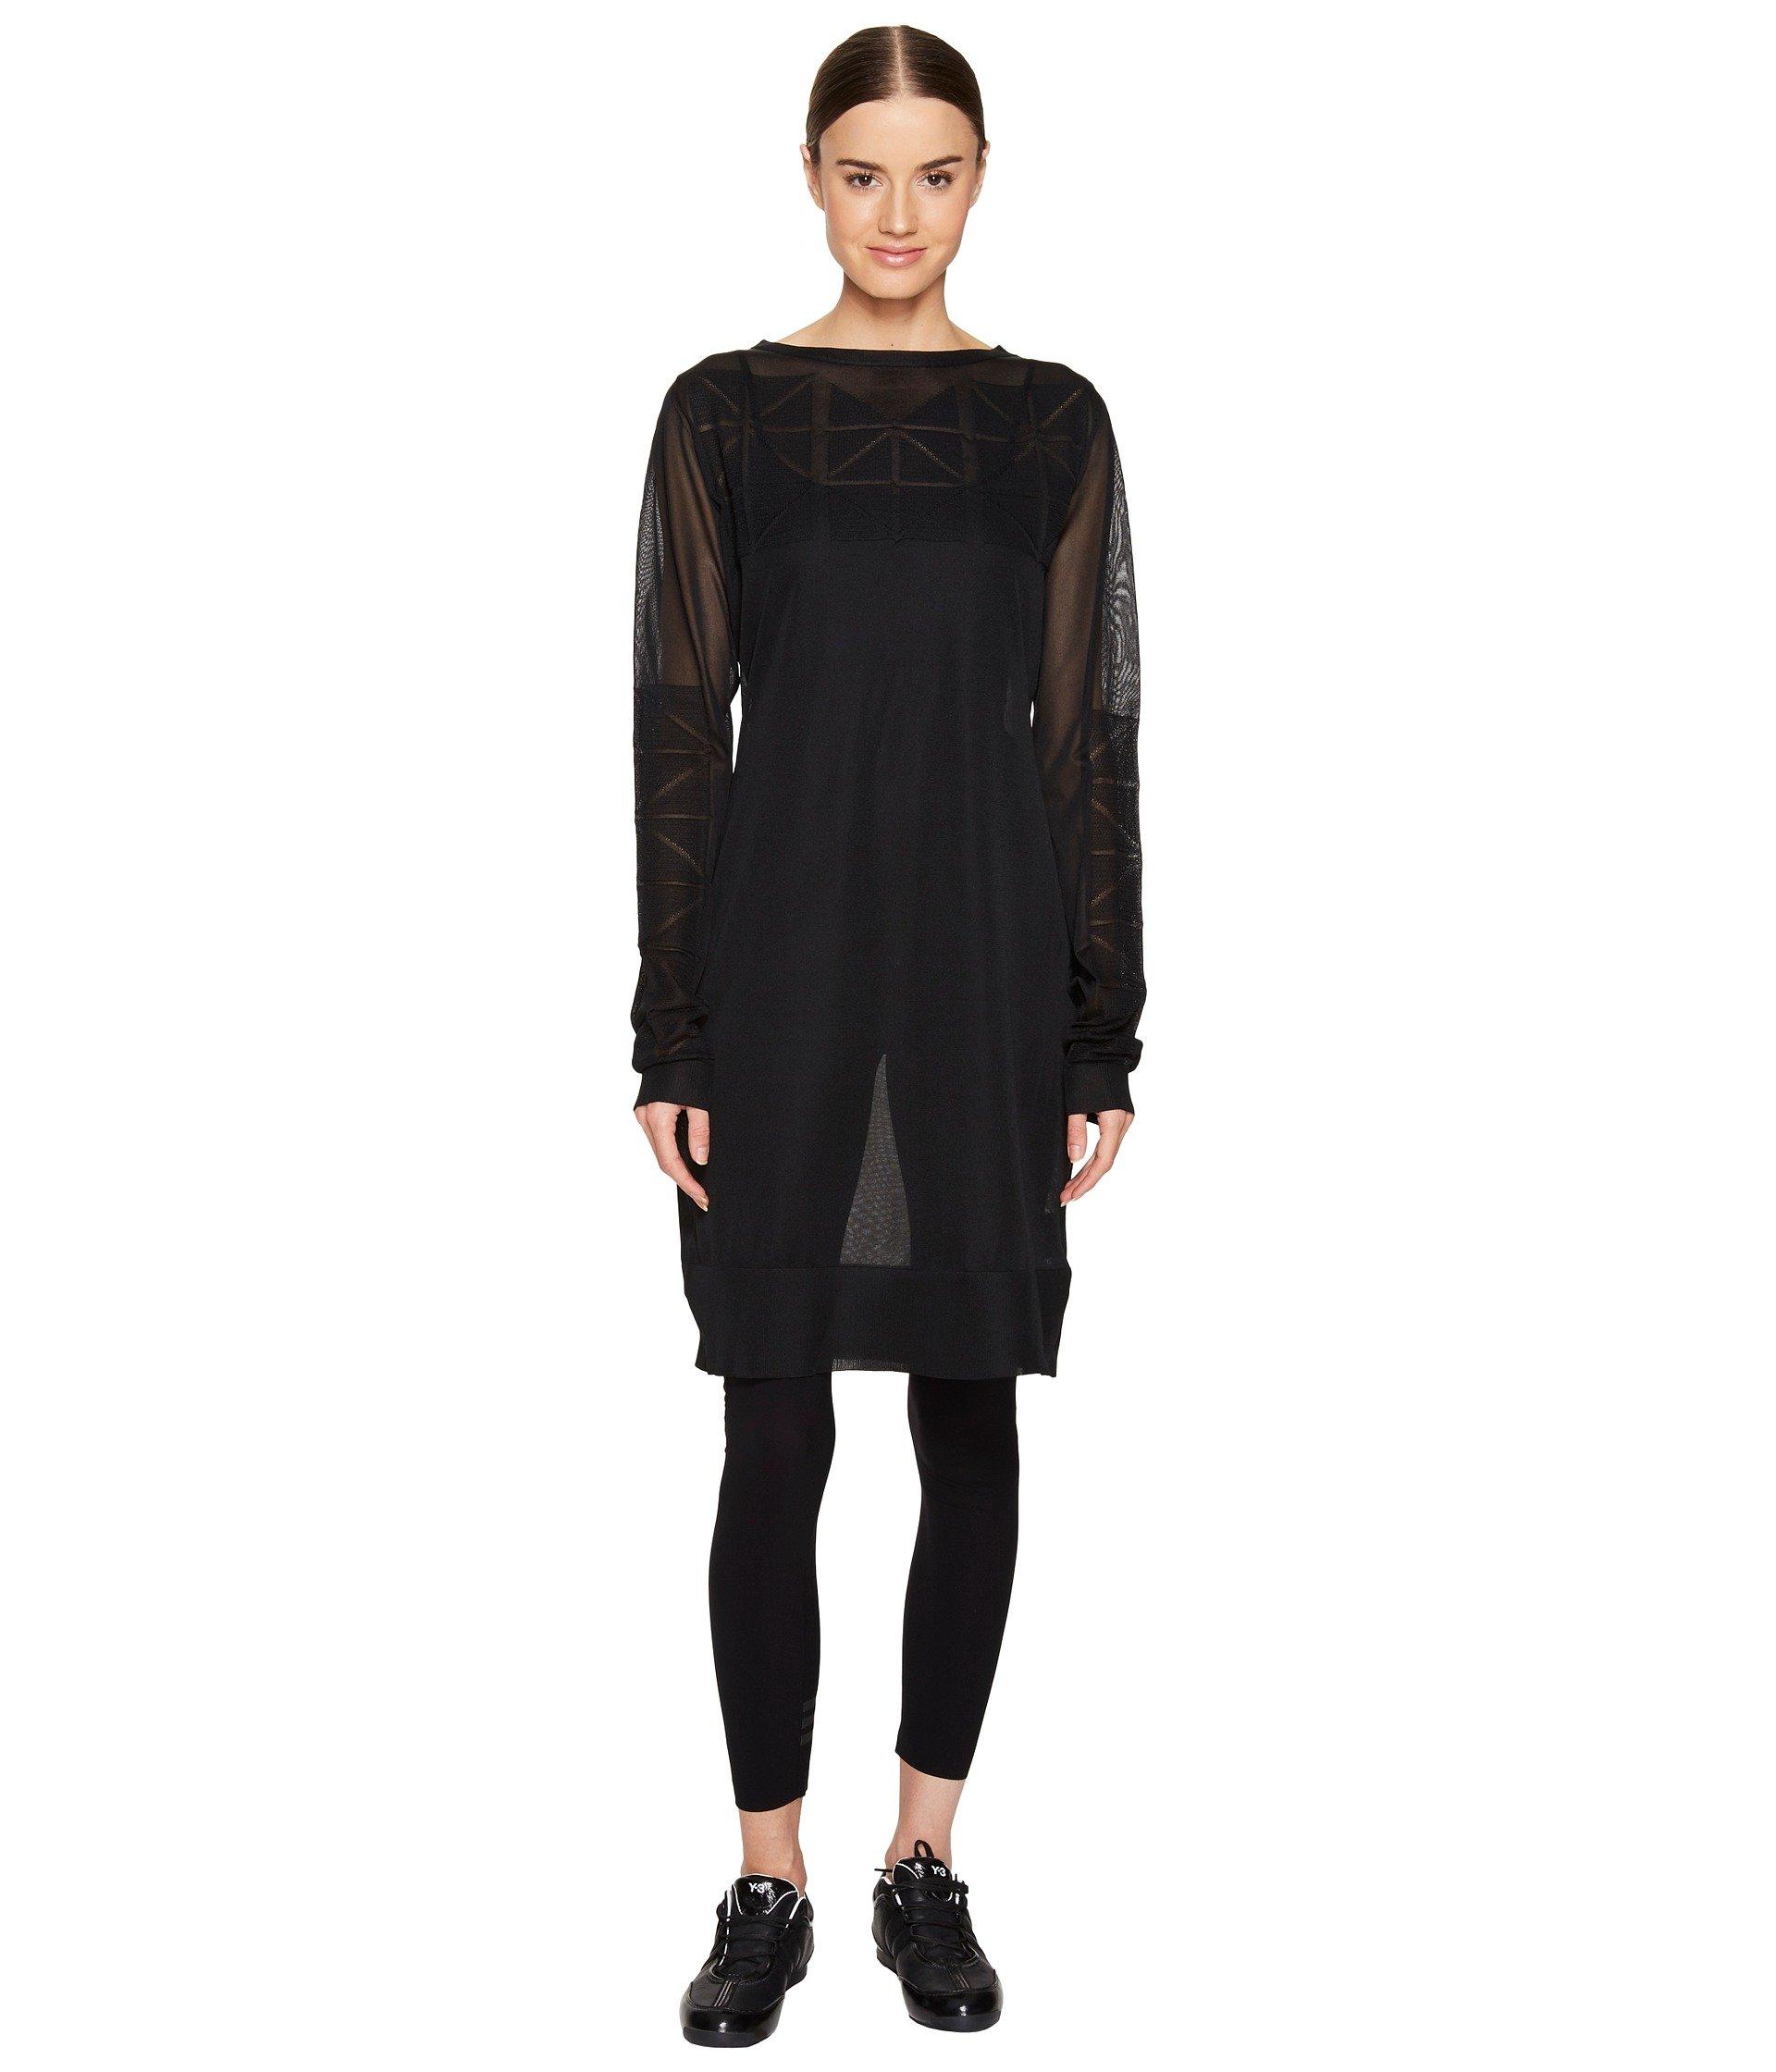 Blusa para Mujer adidas Y-3 by Yohji Yamamoto Knit Long Sleeve Top  + adidas en VeoyCompro.net